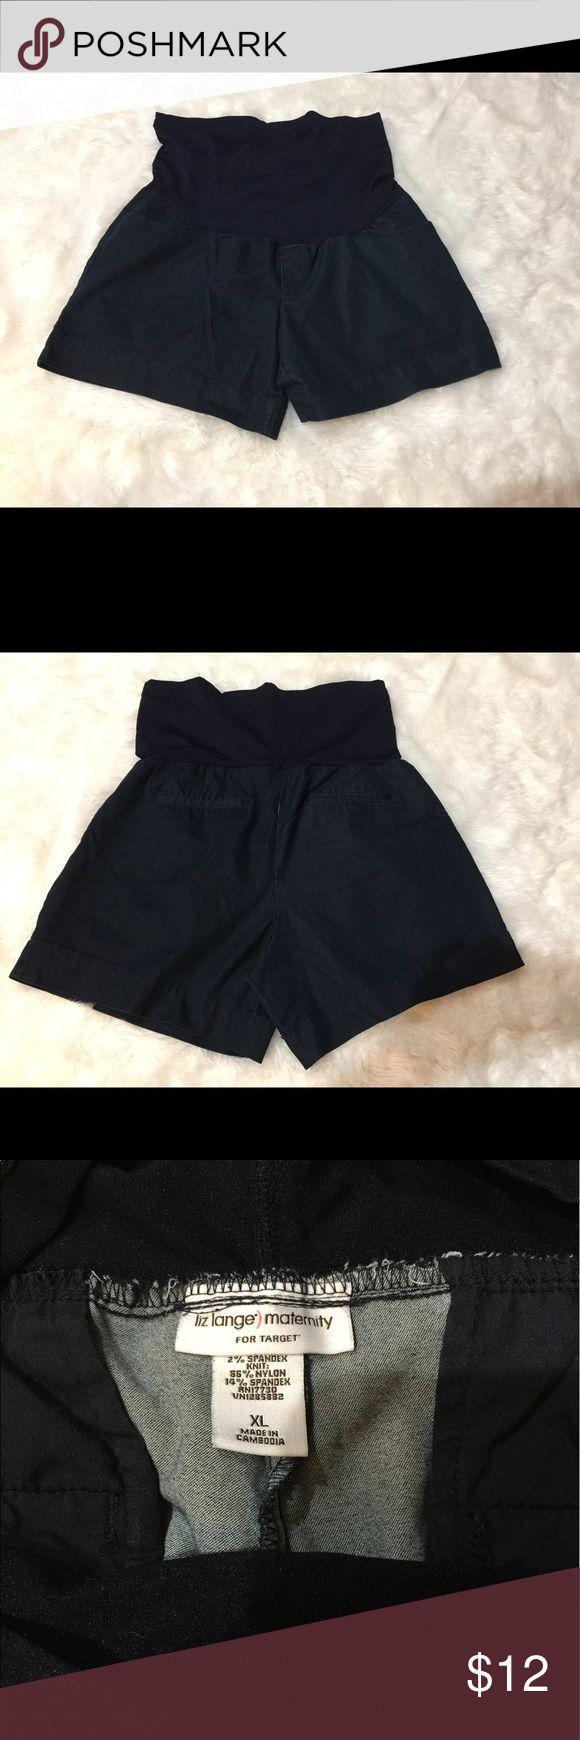 Liz Lange target maternity shorts 🎯 size Xl Jean shorts, elastic maternity band, Liz Lange, XL Liz Lange Shorts Jean Shorts